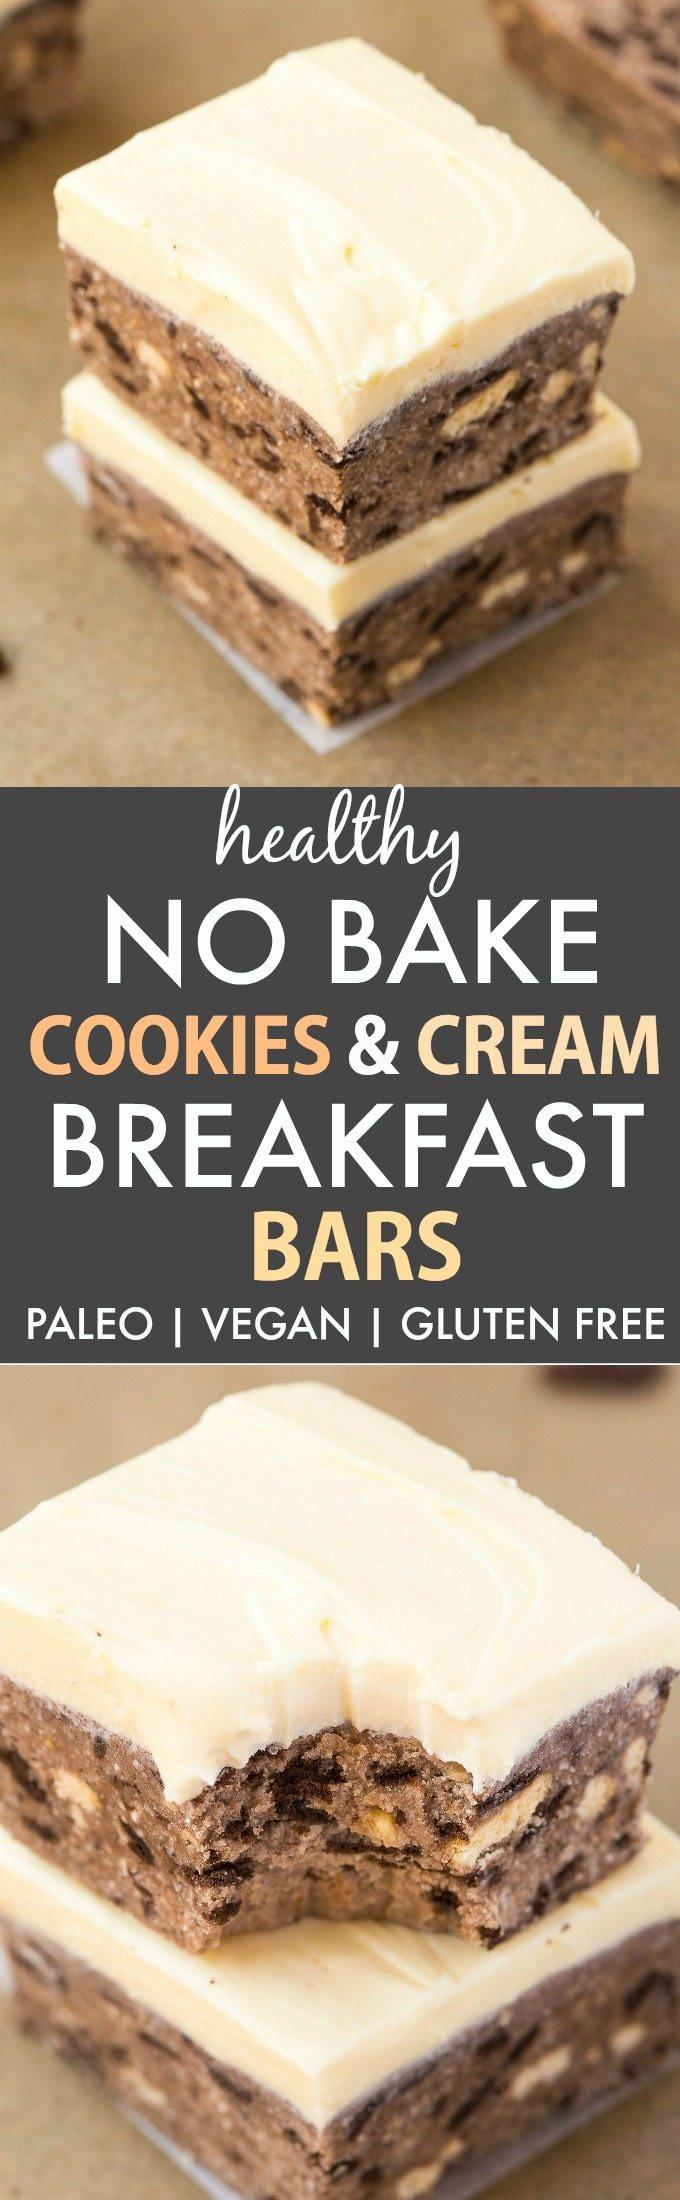 Healthy Breakfast Cookies And Bars  Healthy No Bake Cookies and Cream Breakfast Bars Paleo